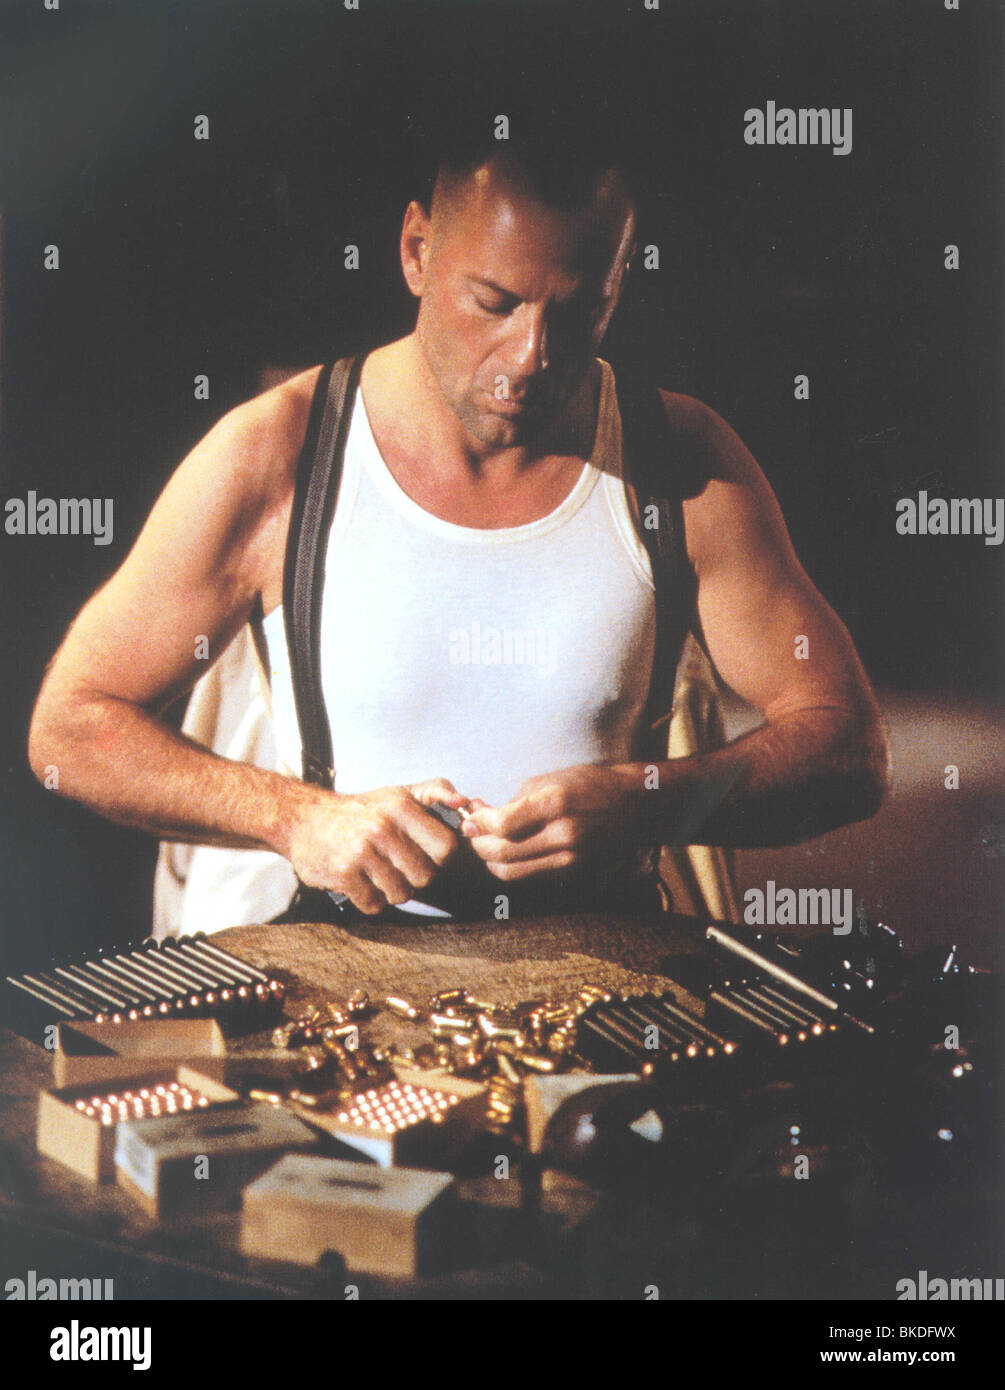 LAST MAN STANDING (1996) BRUCE WILLIS LAMA 004CP - Stock Image